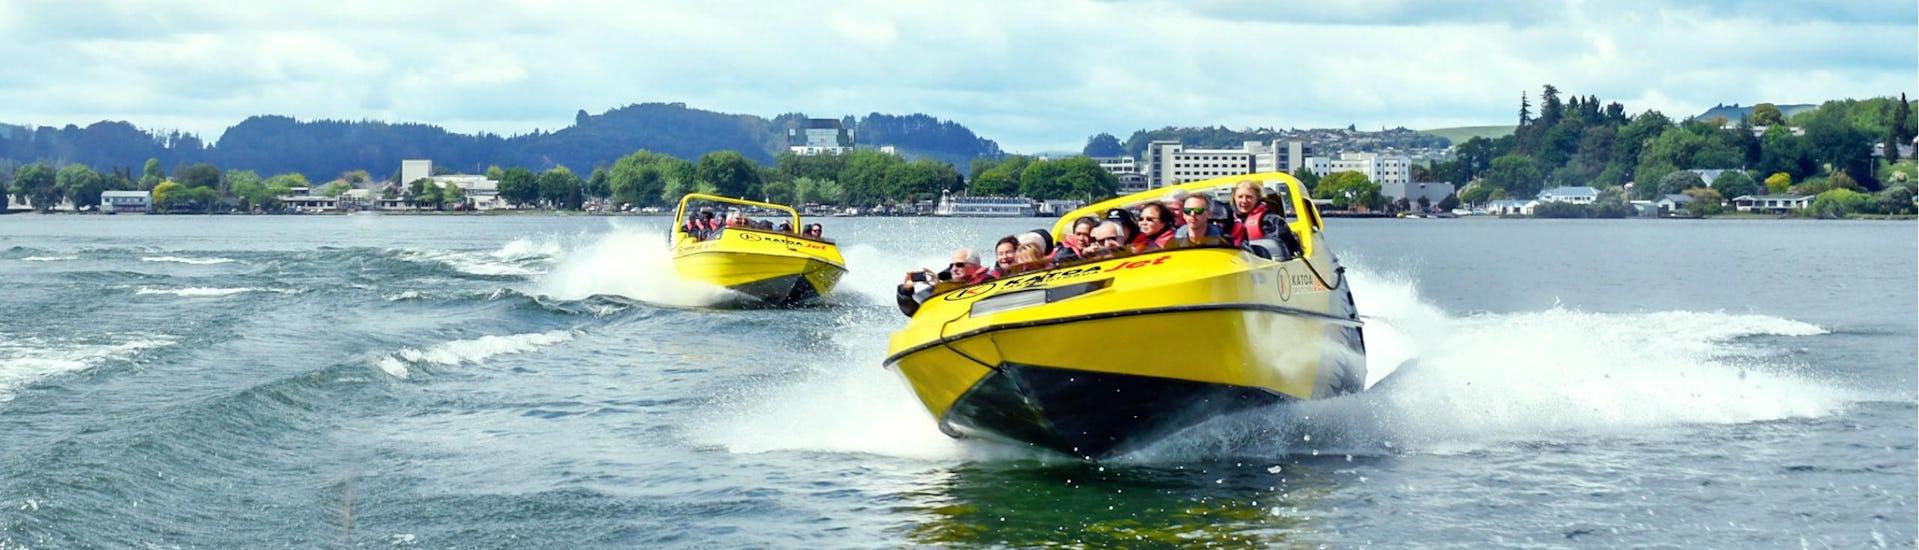 Two groups of people can be seen Jet Boating in Rotorua with Katoa Lake Rotorua.